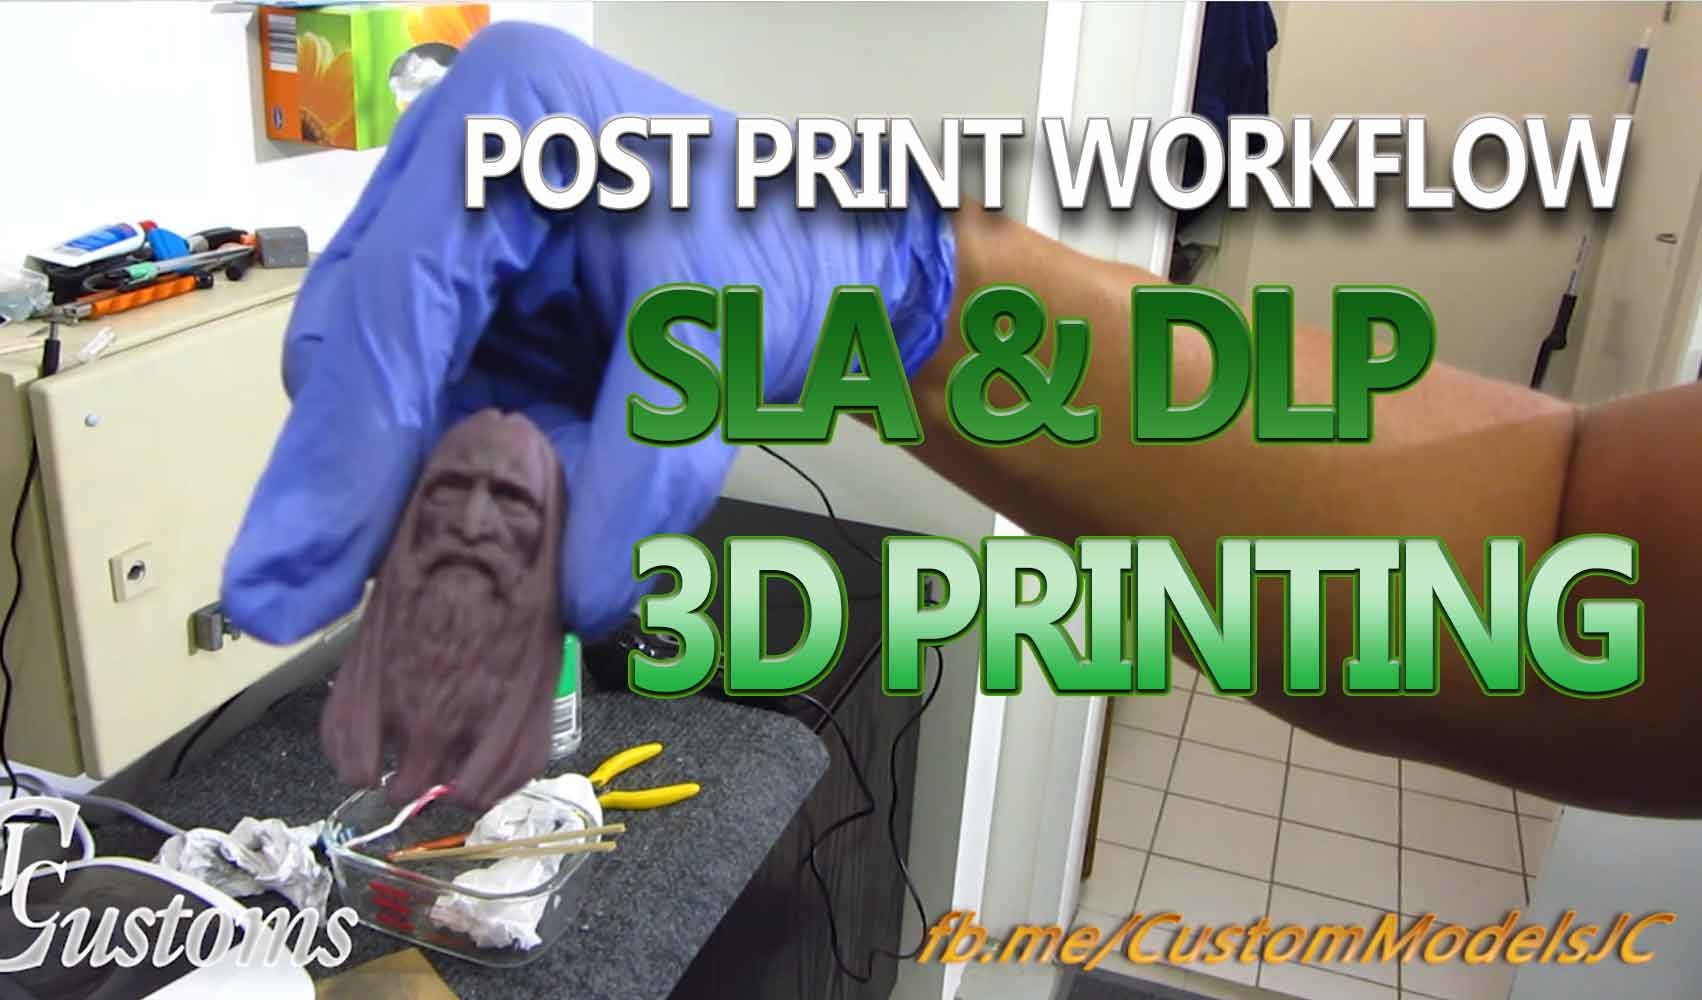 Post print tips with SLA Resin printers _ Tutorial _ By John Chen Post print tips with SLA Resin printers Post print tips with SLA Resin printers,John Chen